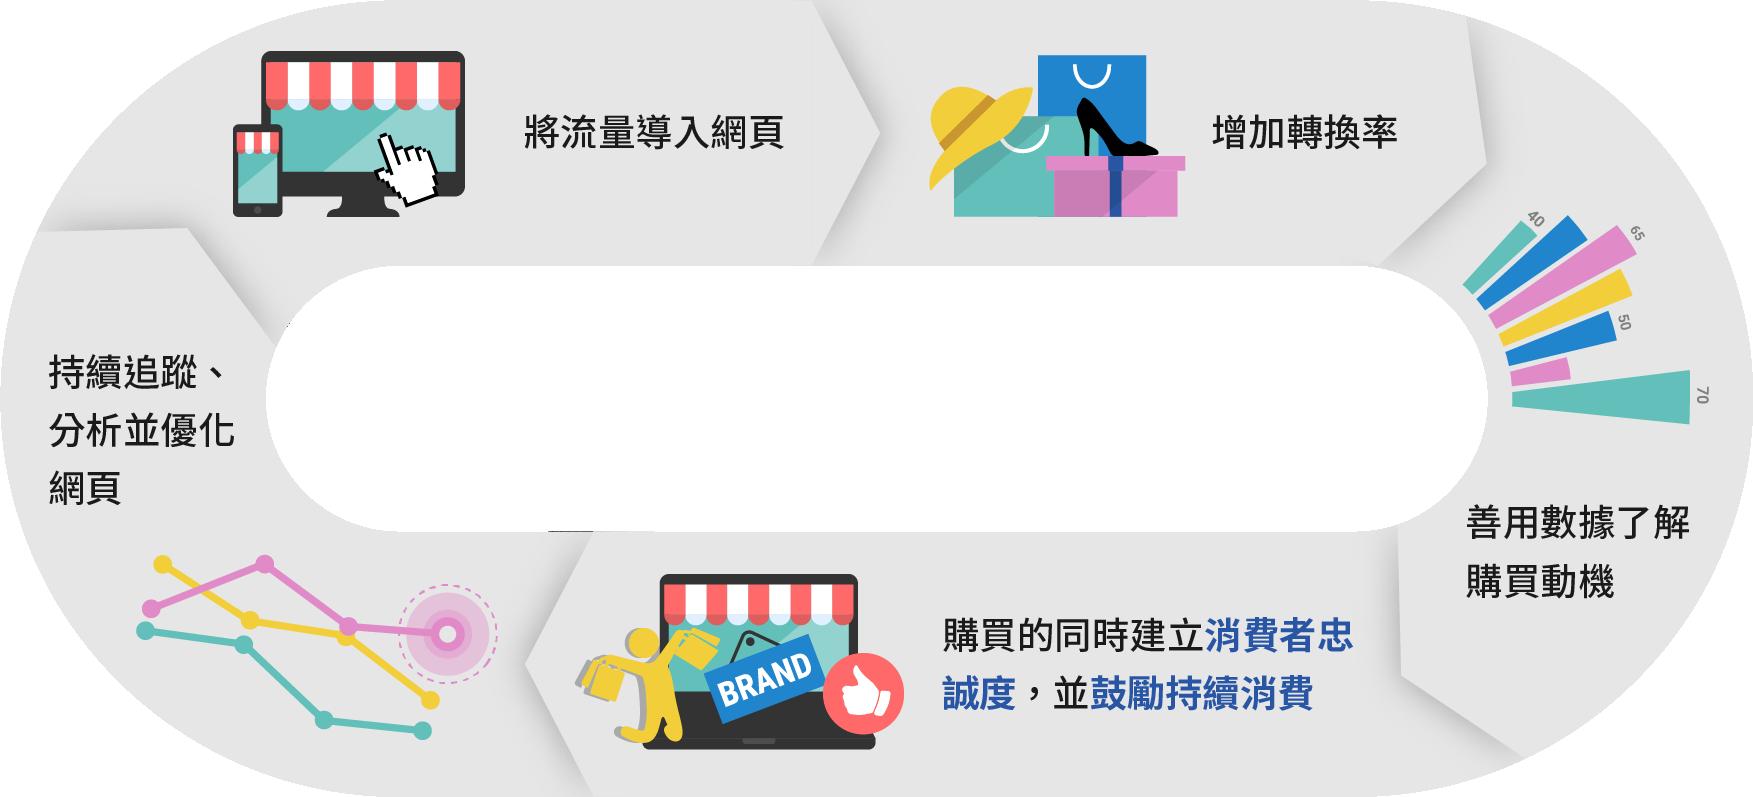 eCommerce circle